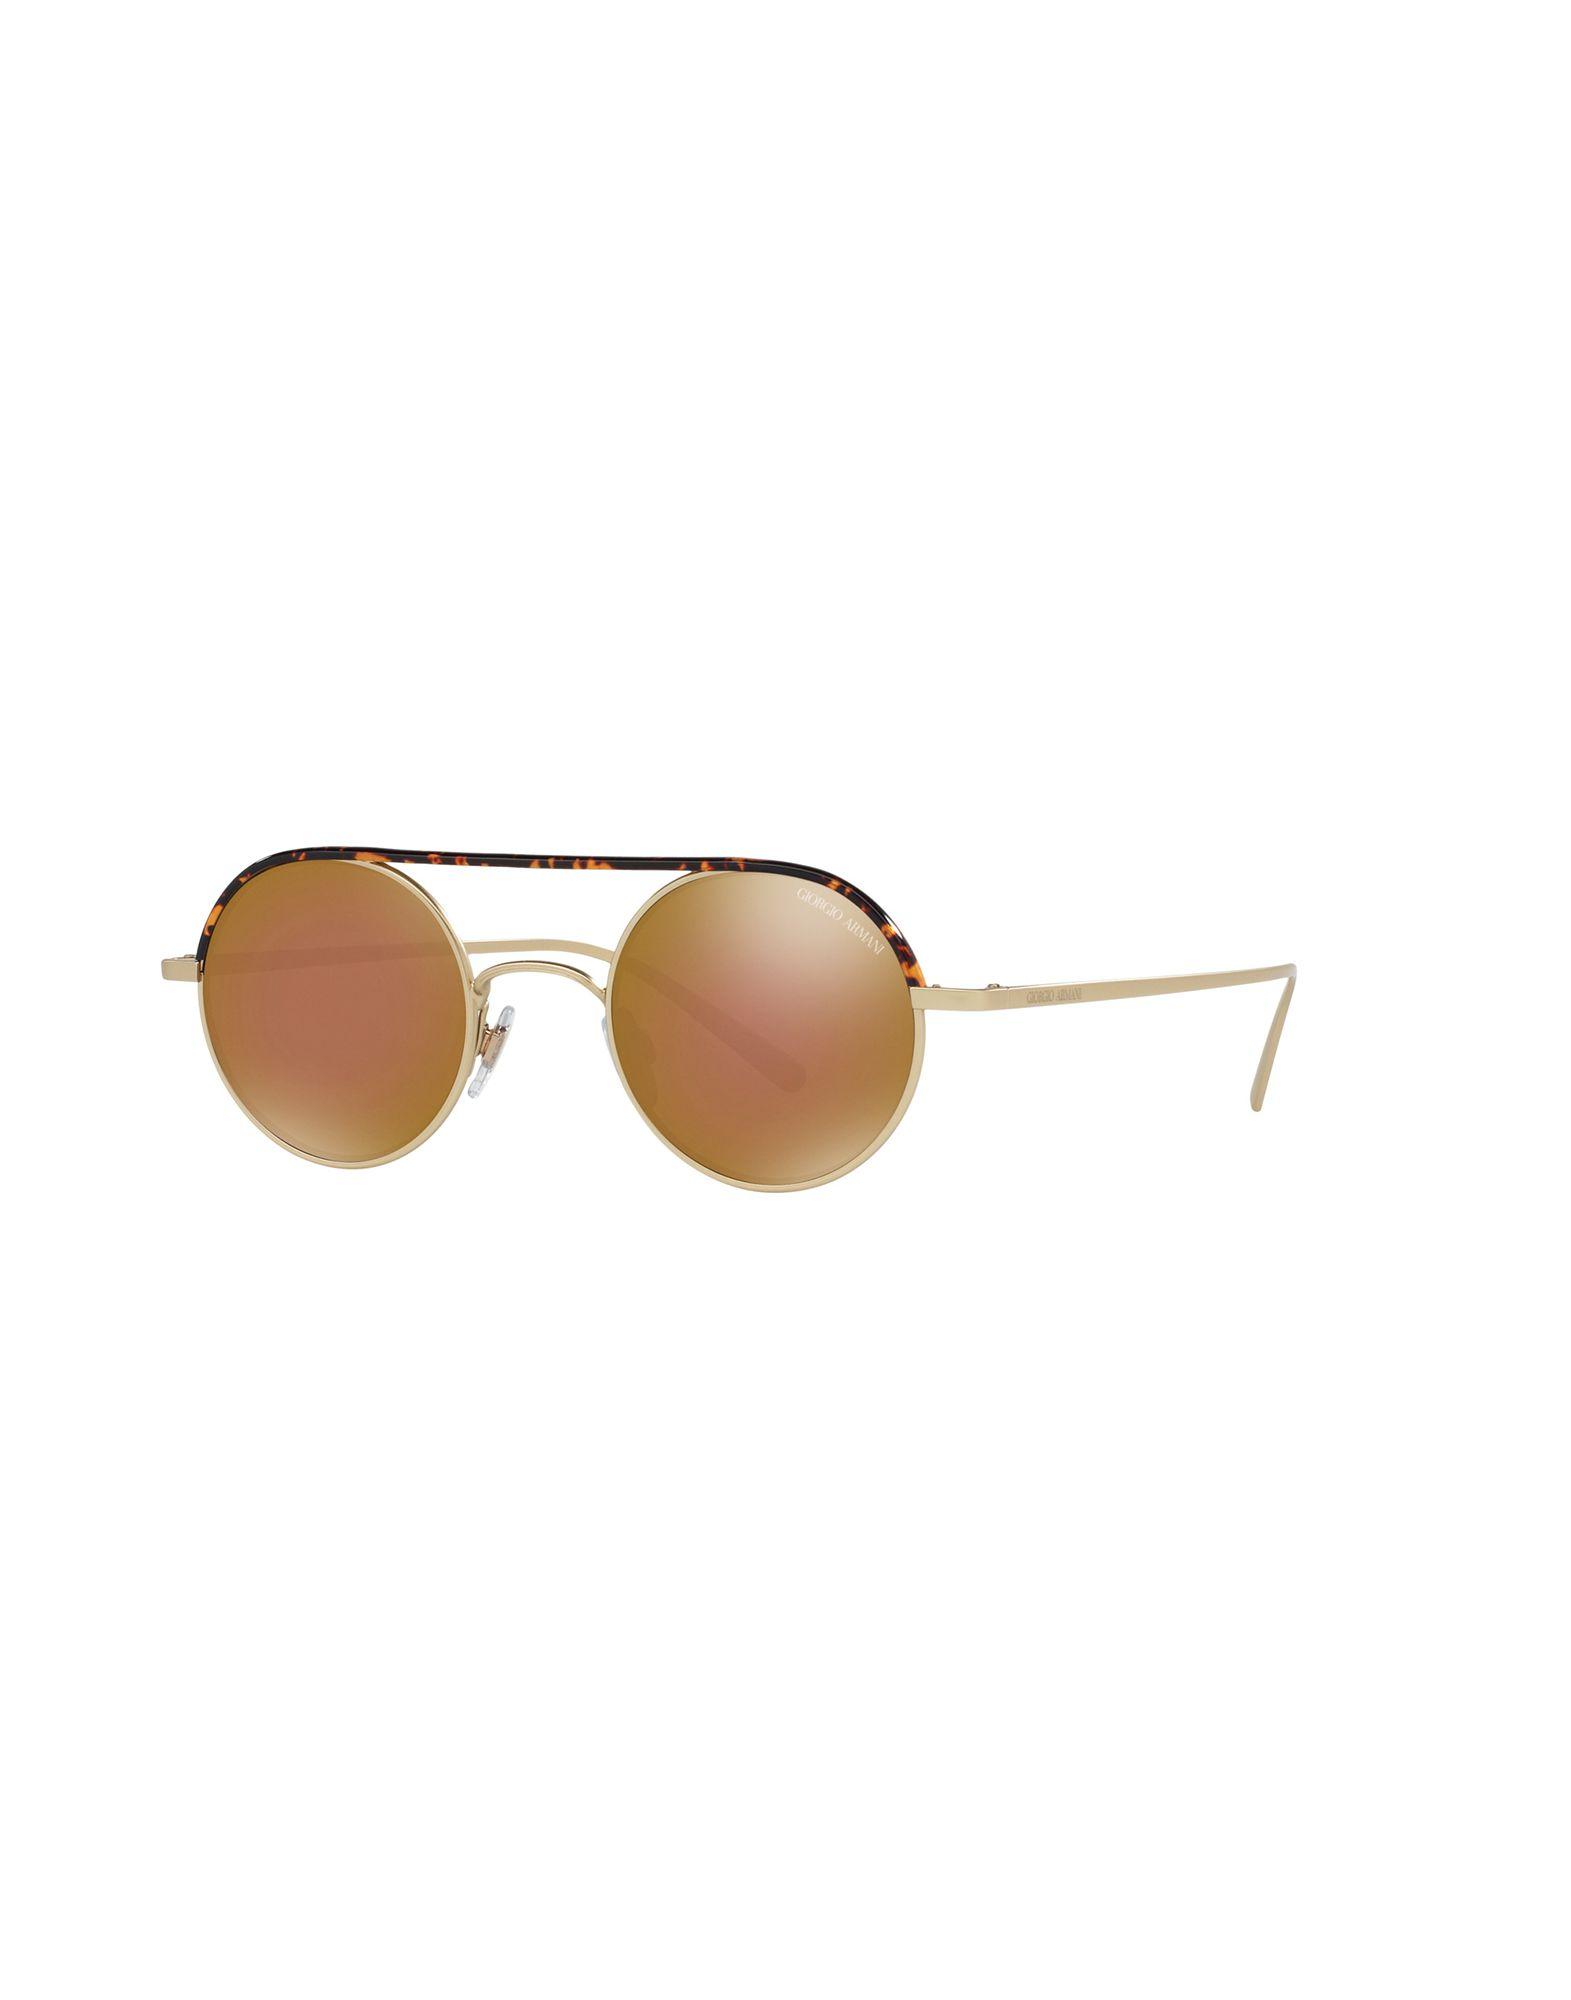 Occhiali Da Sole Dolce & Gabbana Ar6044j - Uomo - Acquista online su